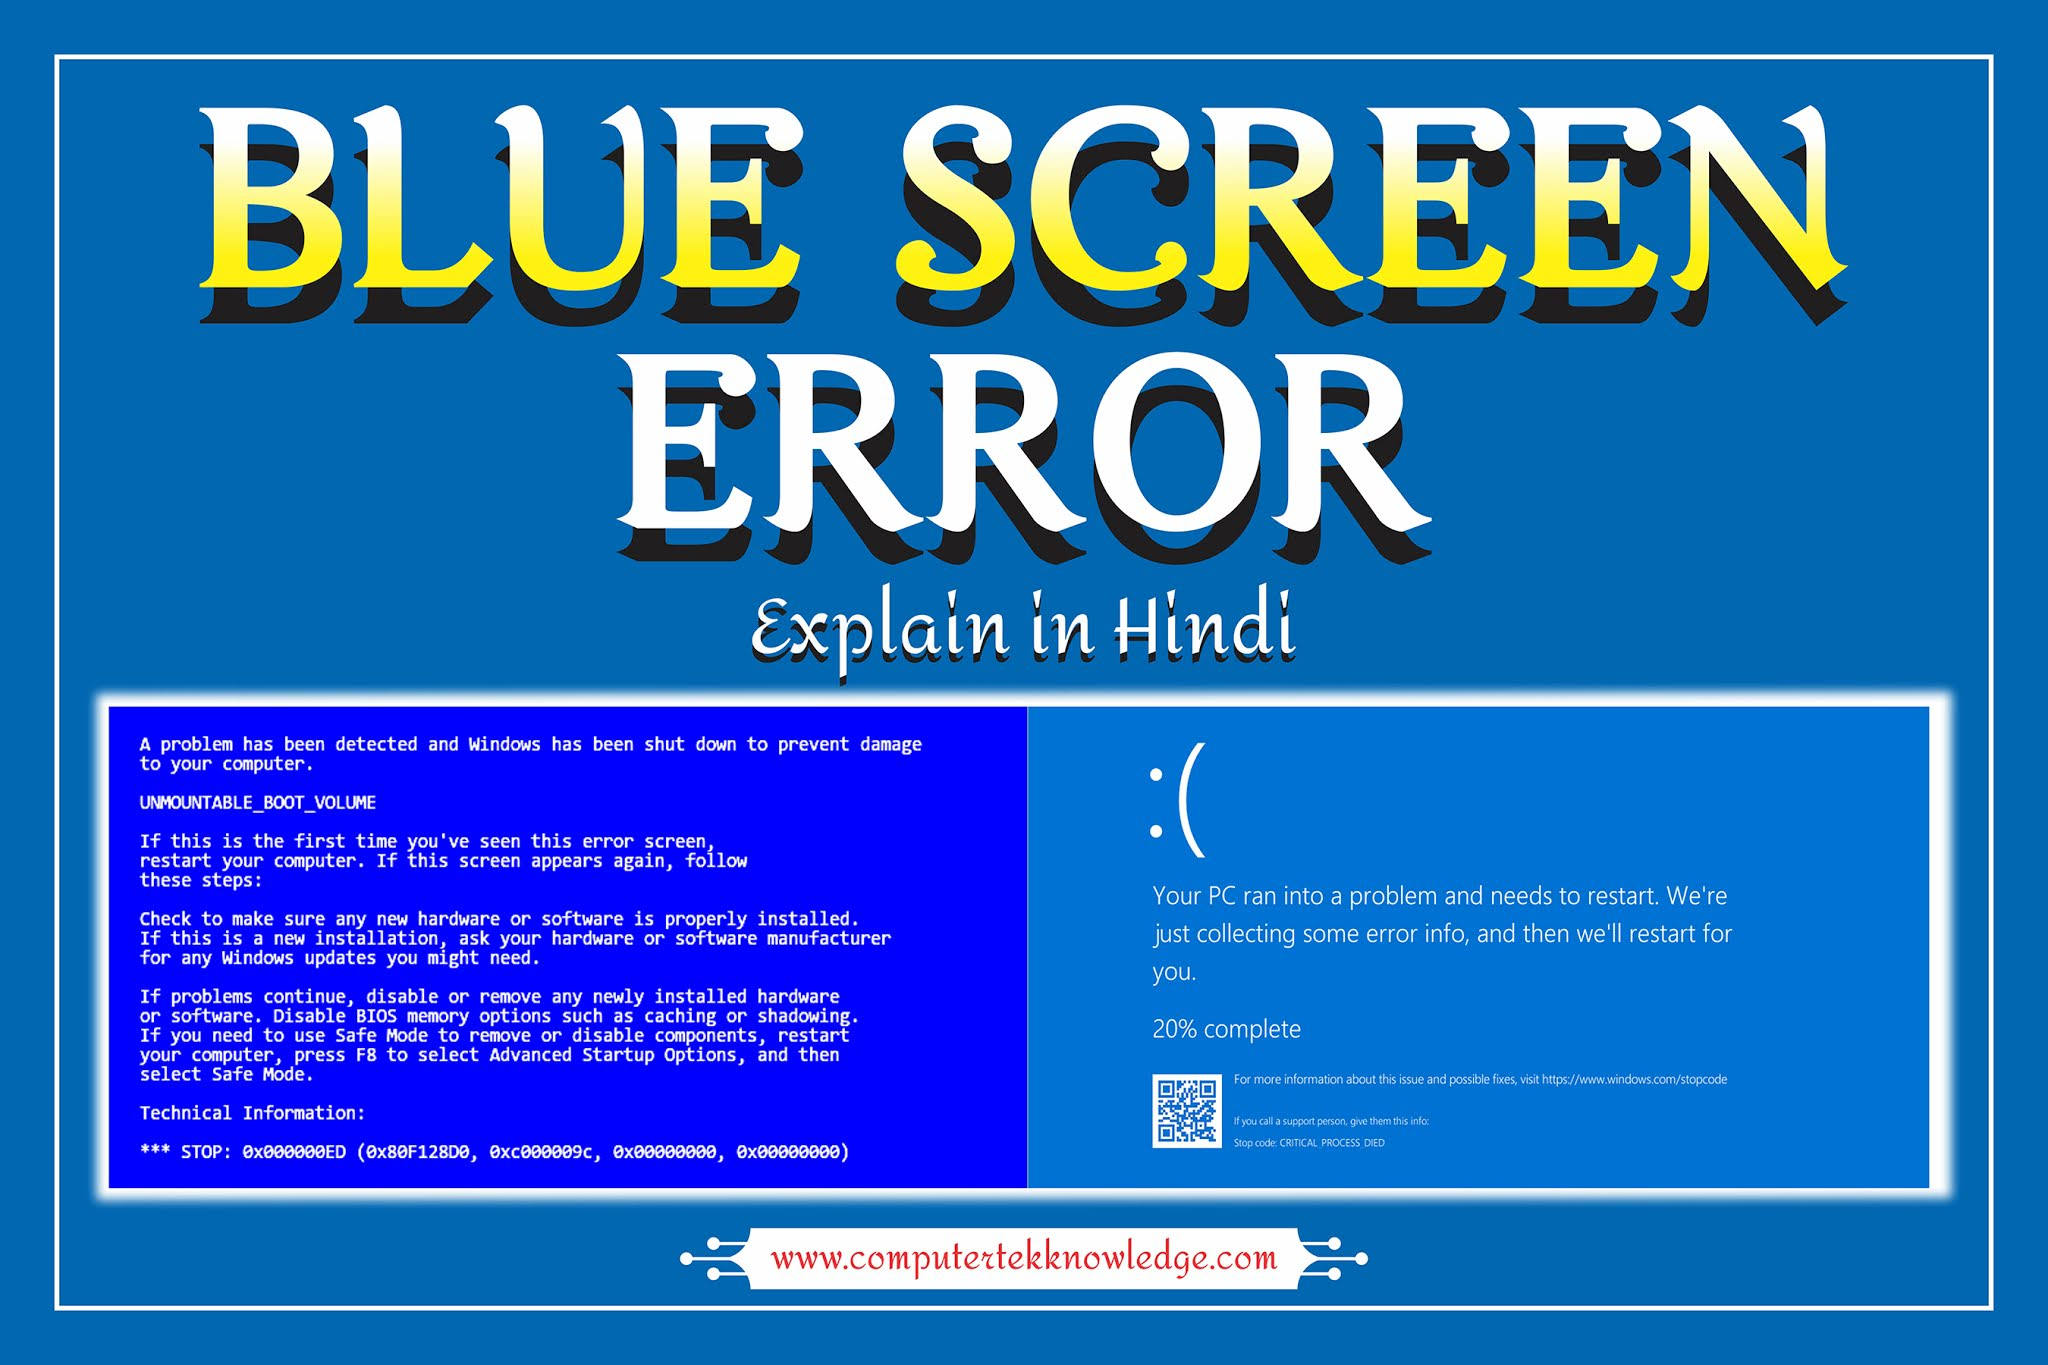 blue-scree-error-explain-in-hindi